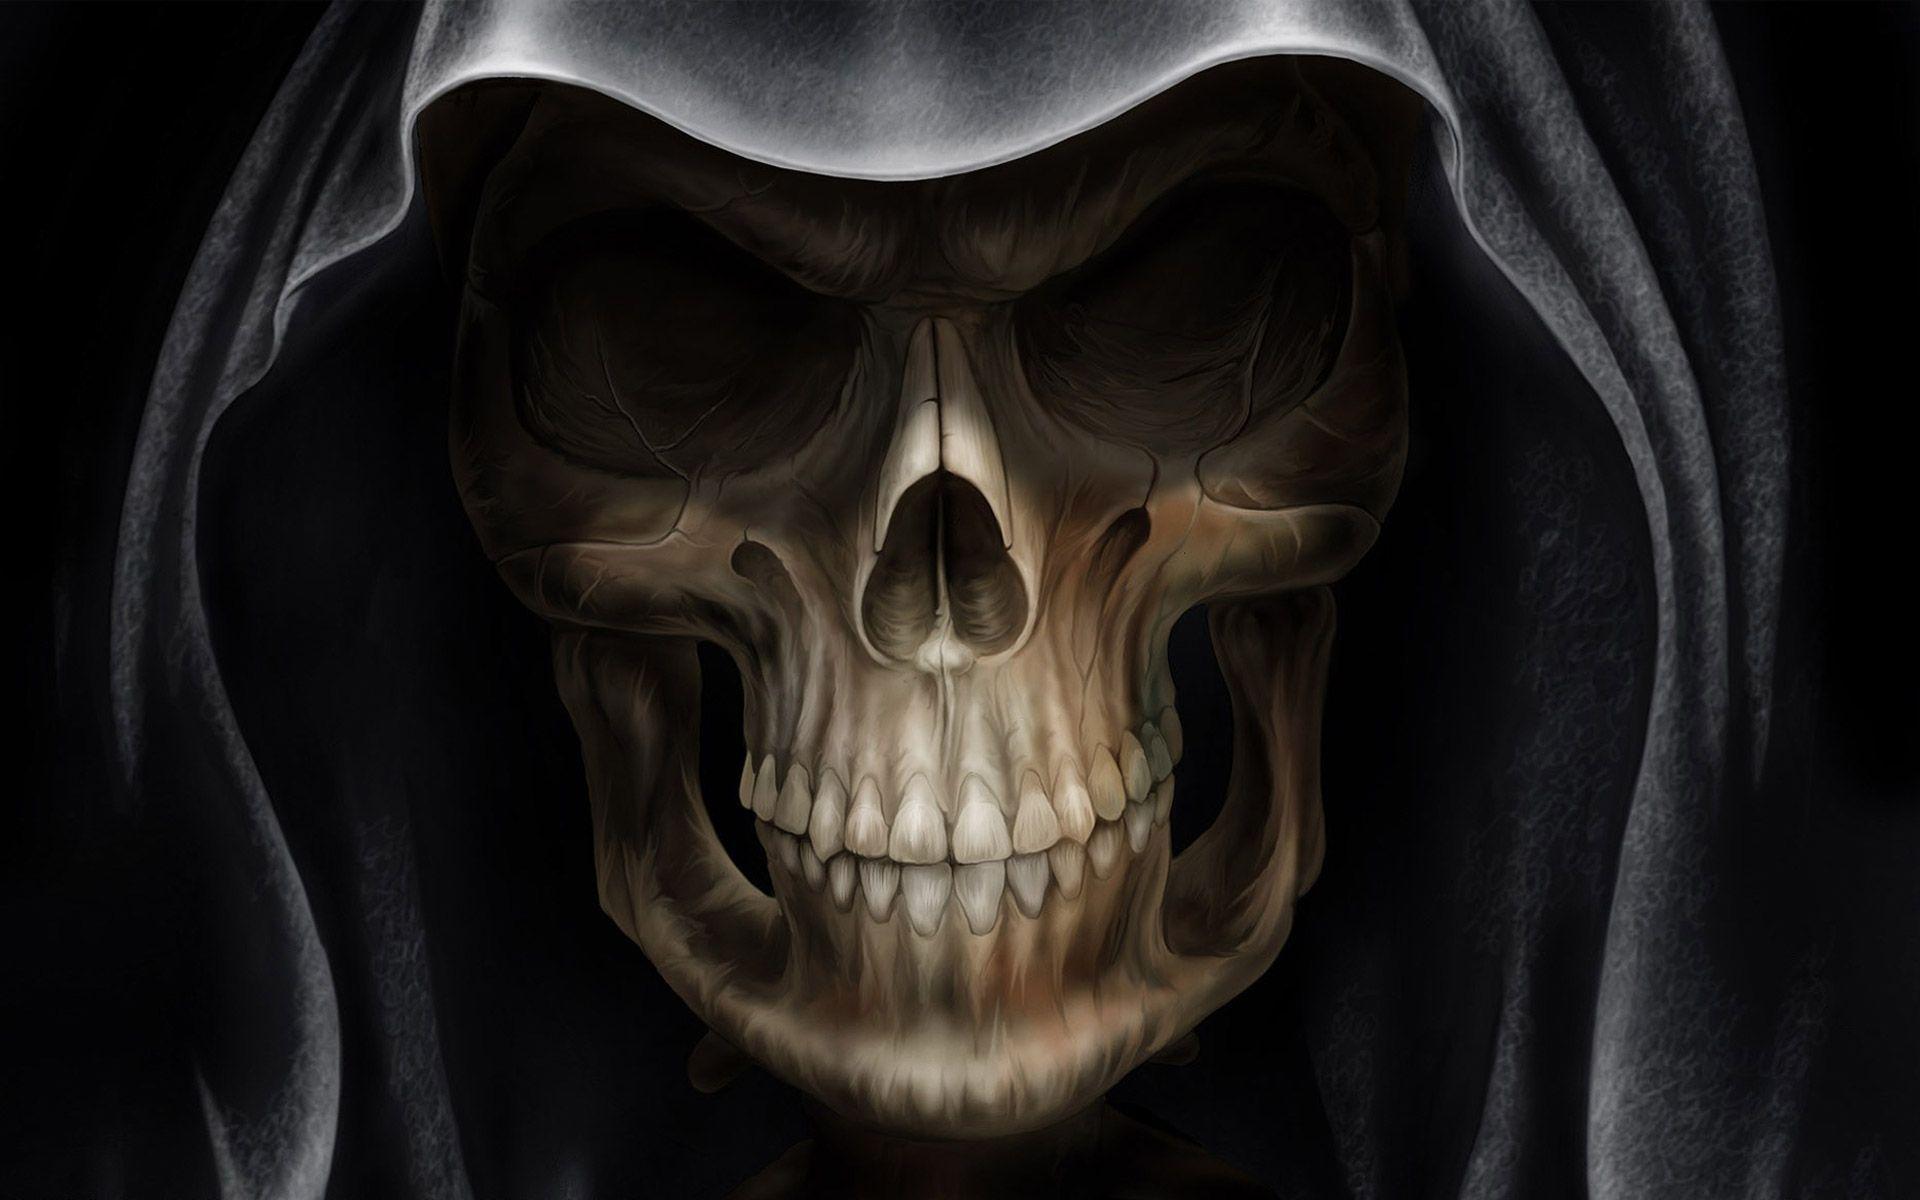 Full HD 1080p Skull Wallpapers HD, Desktop Backgrounds